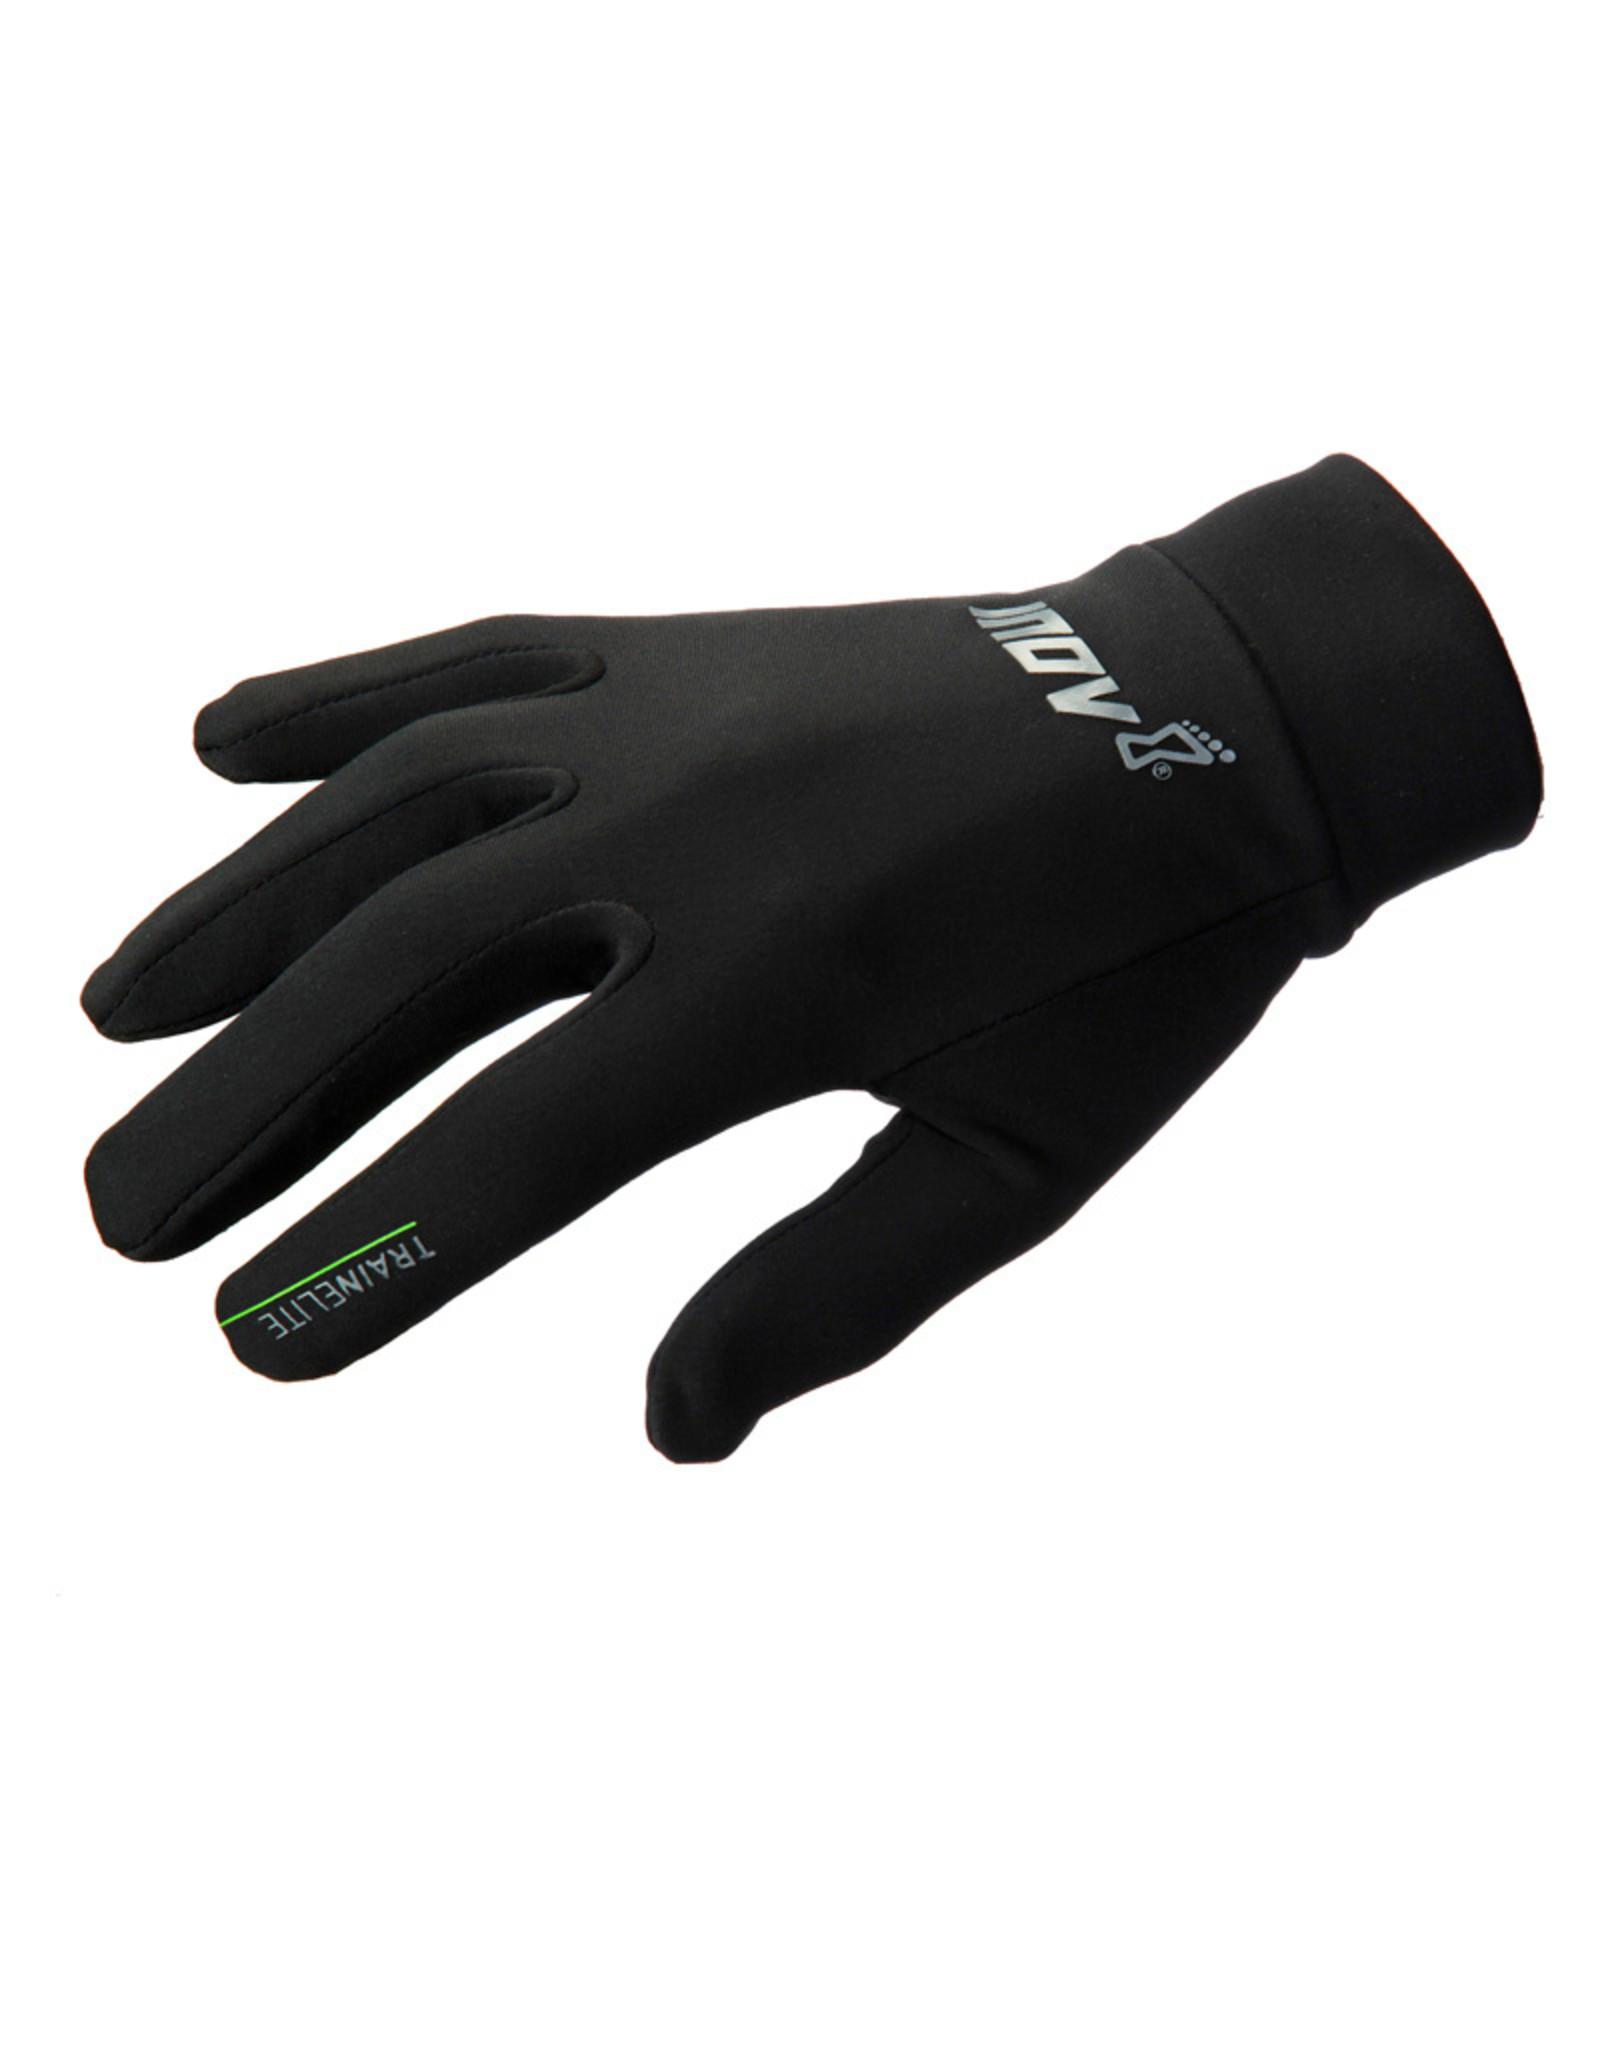 Inov-8 Train Elite Glove Gant - Noir